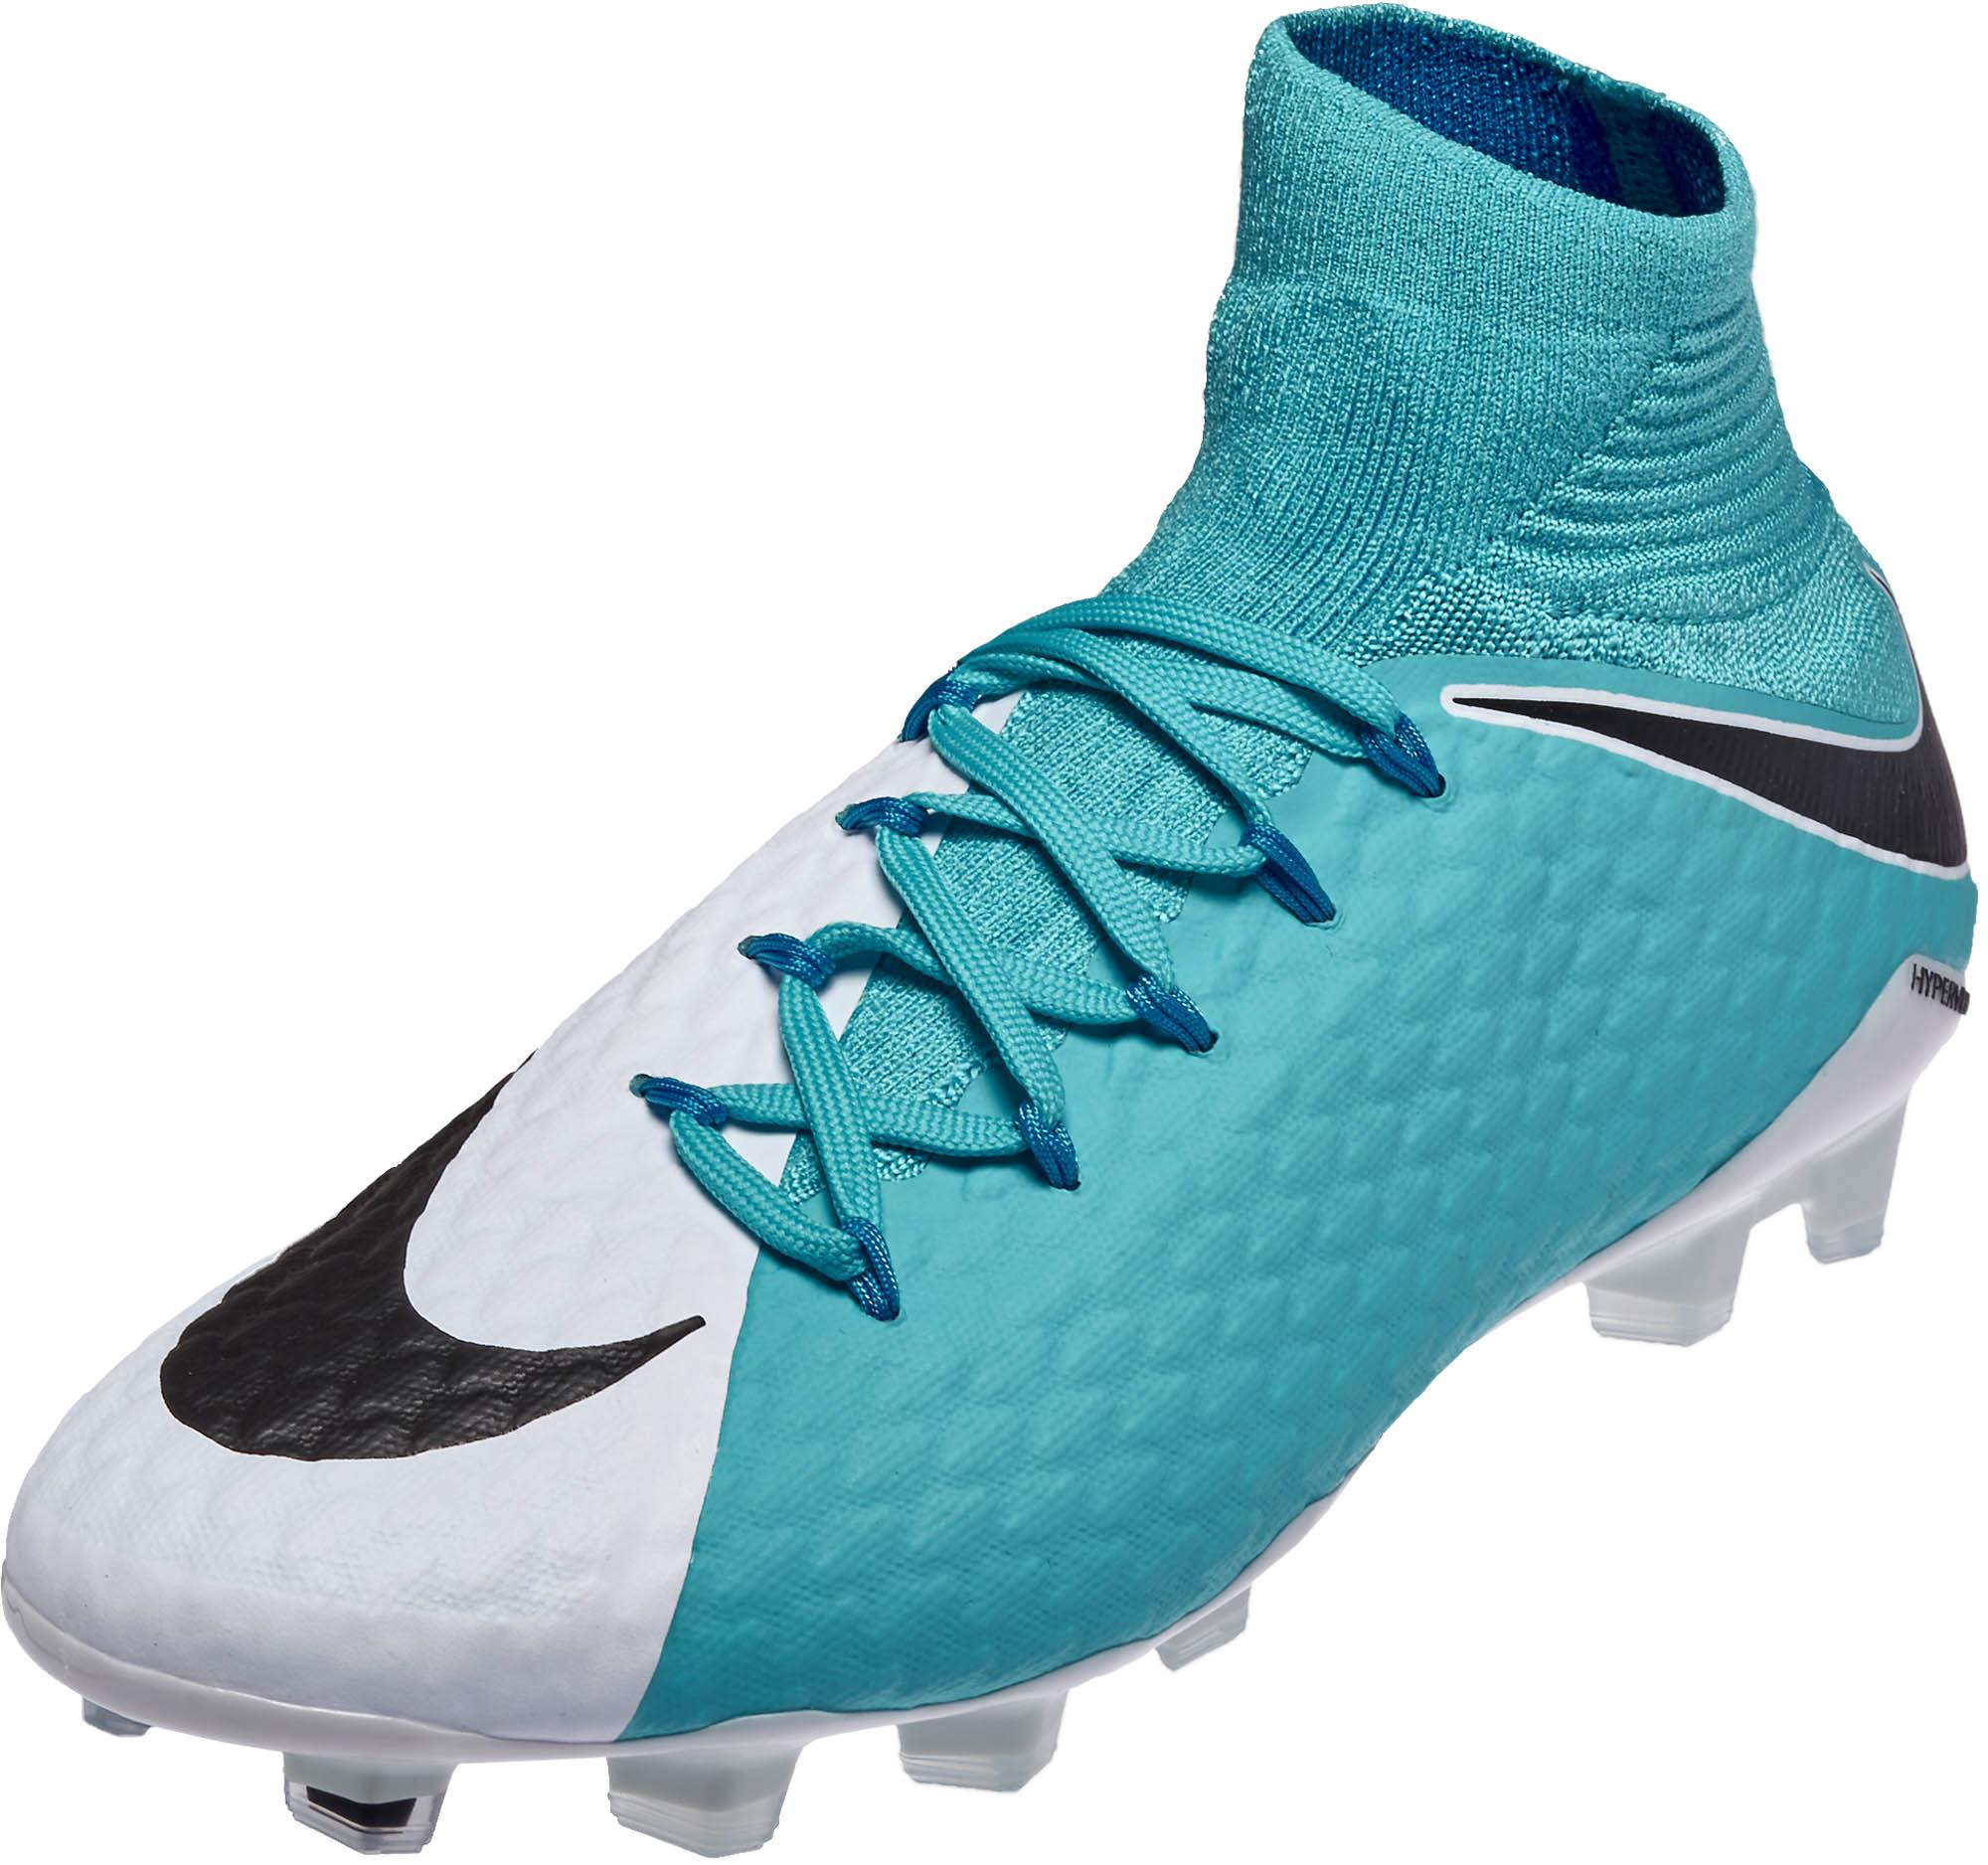 Nike Hypervenom Phatal III DF FG Soccer Cleats - White   Photo Blue ... e40f95e042bb3